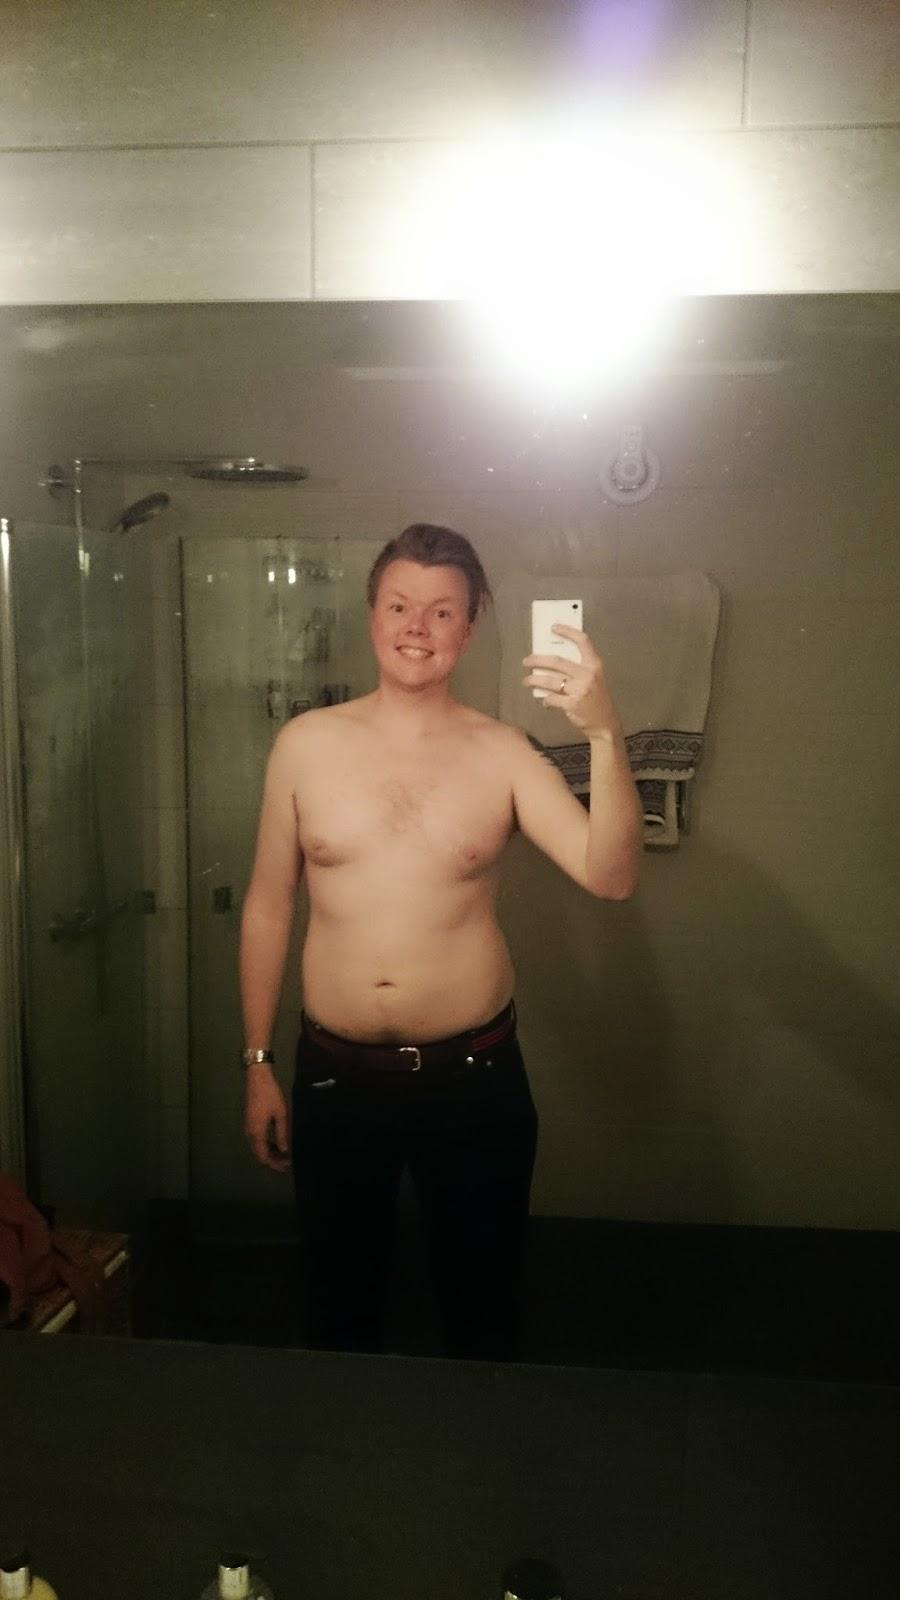 Franks slankeblogg: Resultat veke 35 - Framleis sjuk